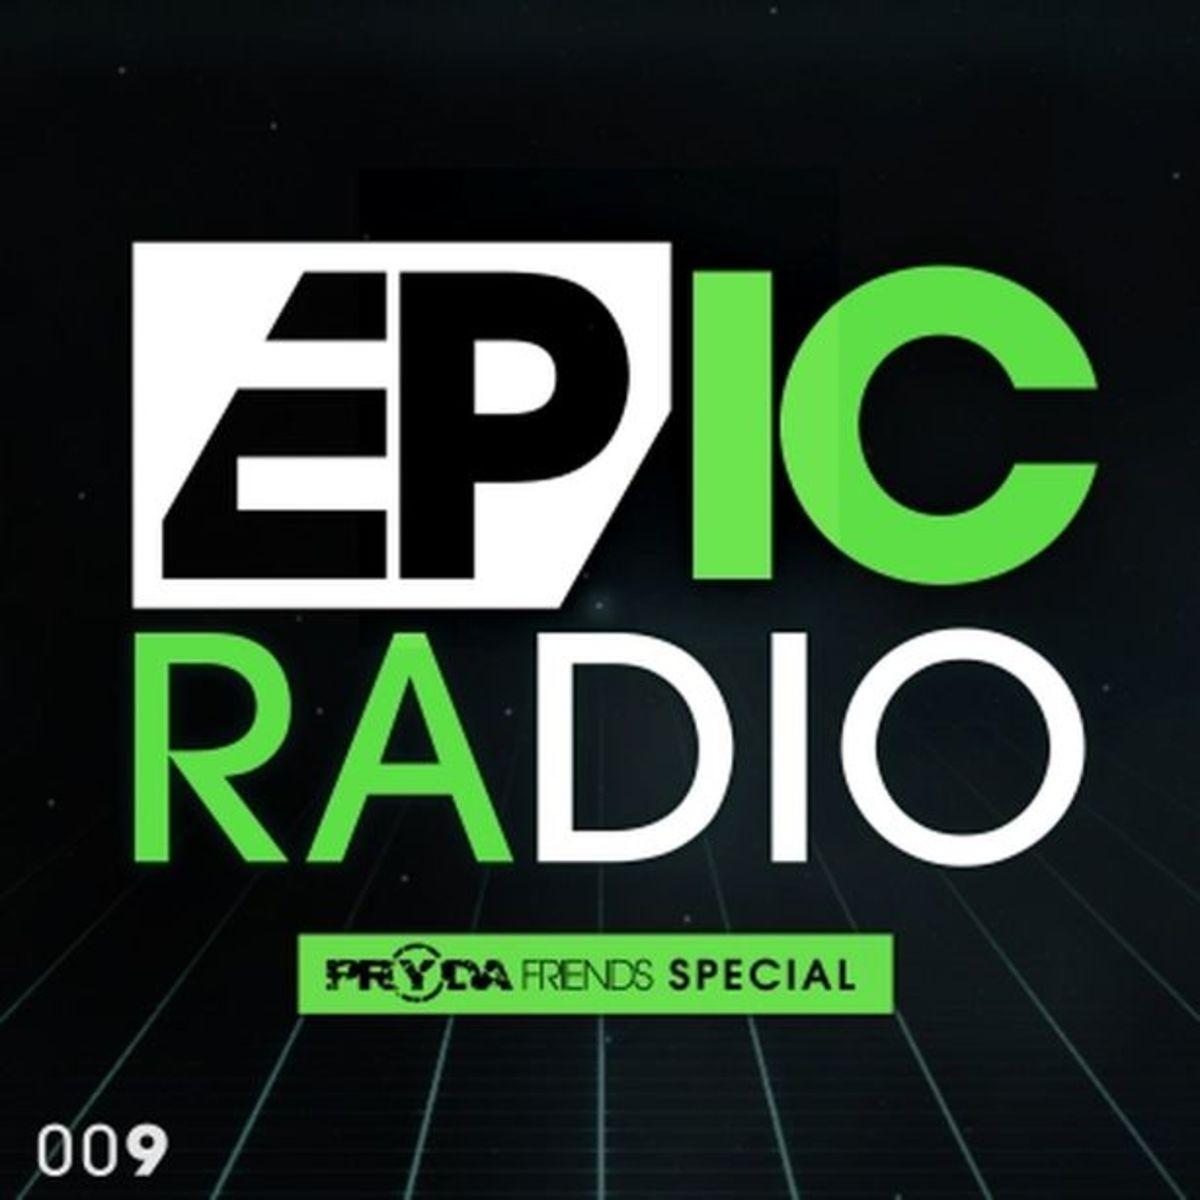 EDM Download: EPIC Radio 009 - Pryda Friends Special with Jeremy Olander & Fehrplay